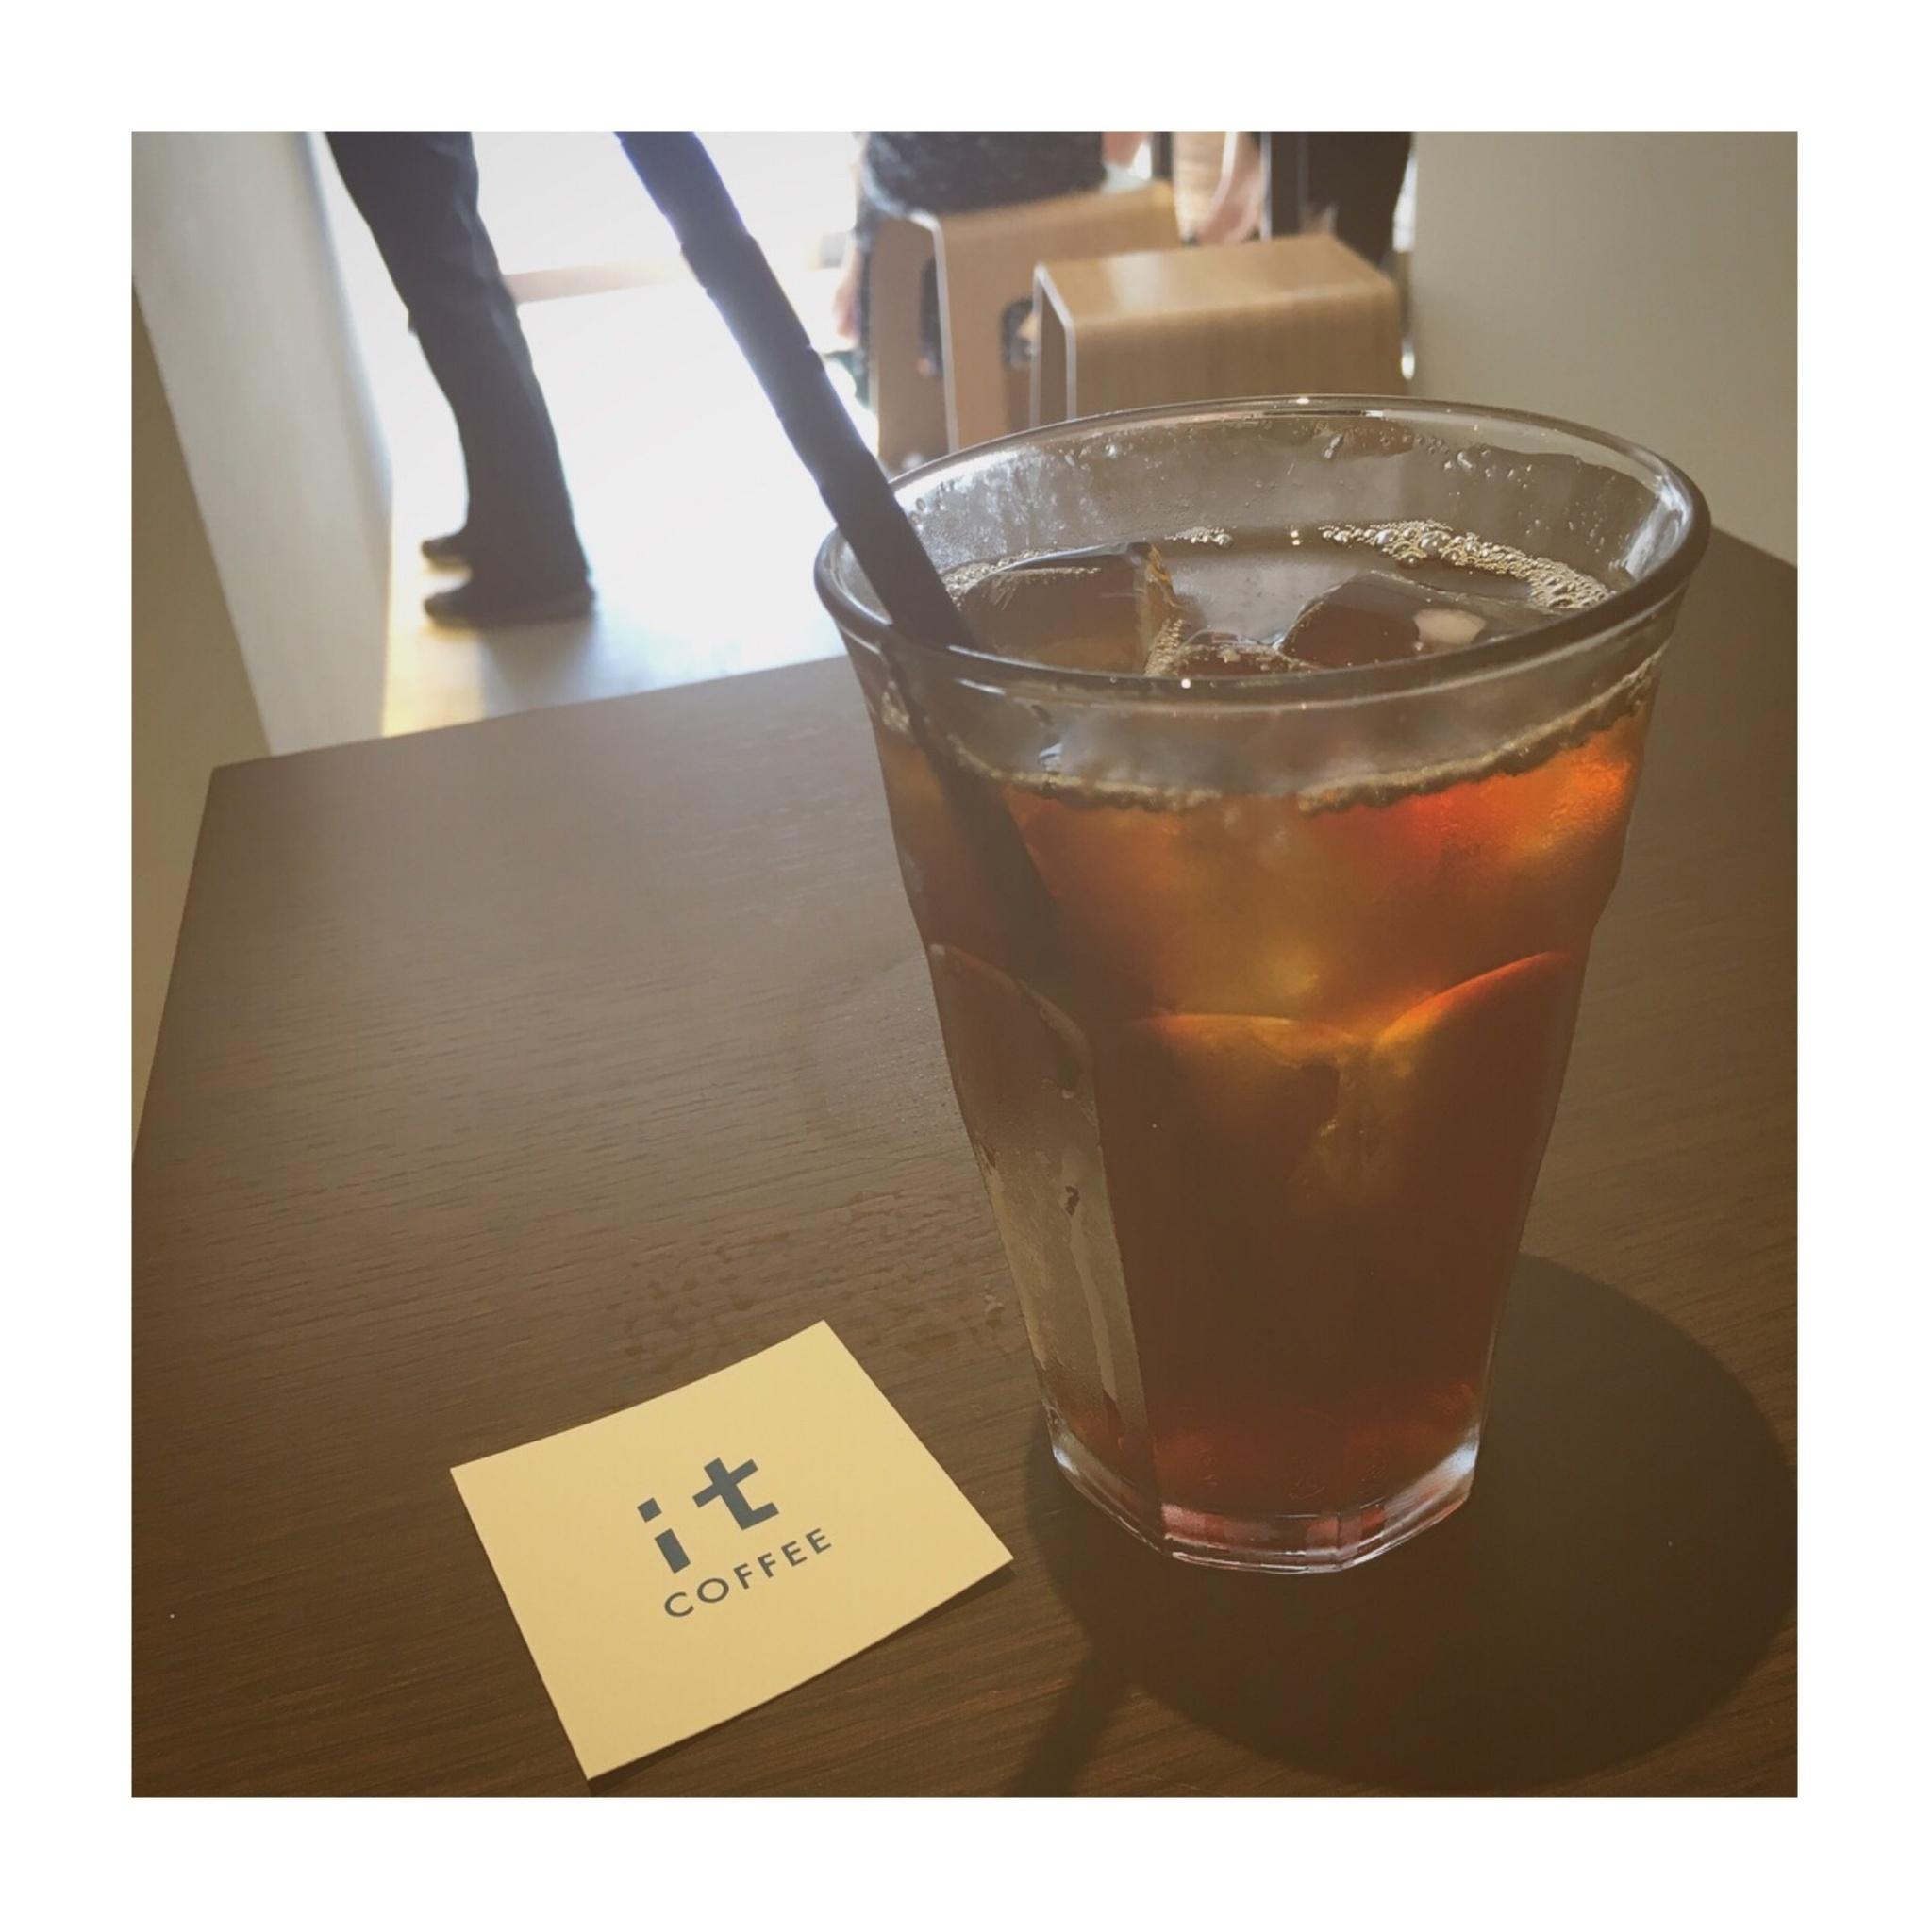 #8【#cafestagram】❤️:《代官山》のおしゃれカフェ☻待ち合わせにもおひとり様でもOK!「it COFFEE」_3